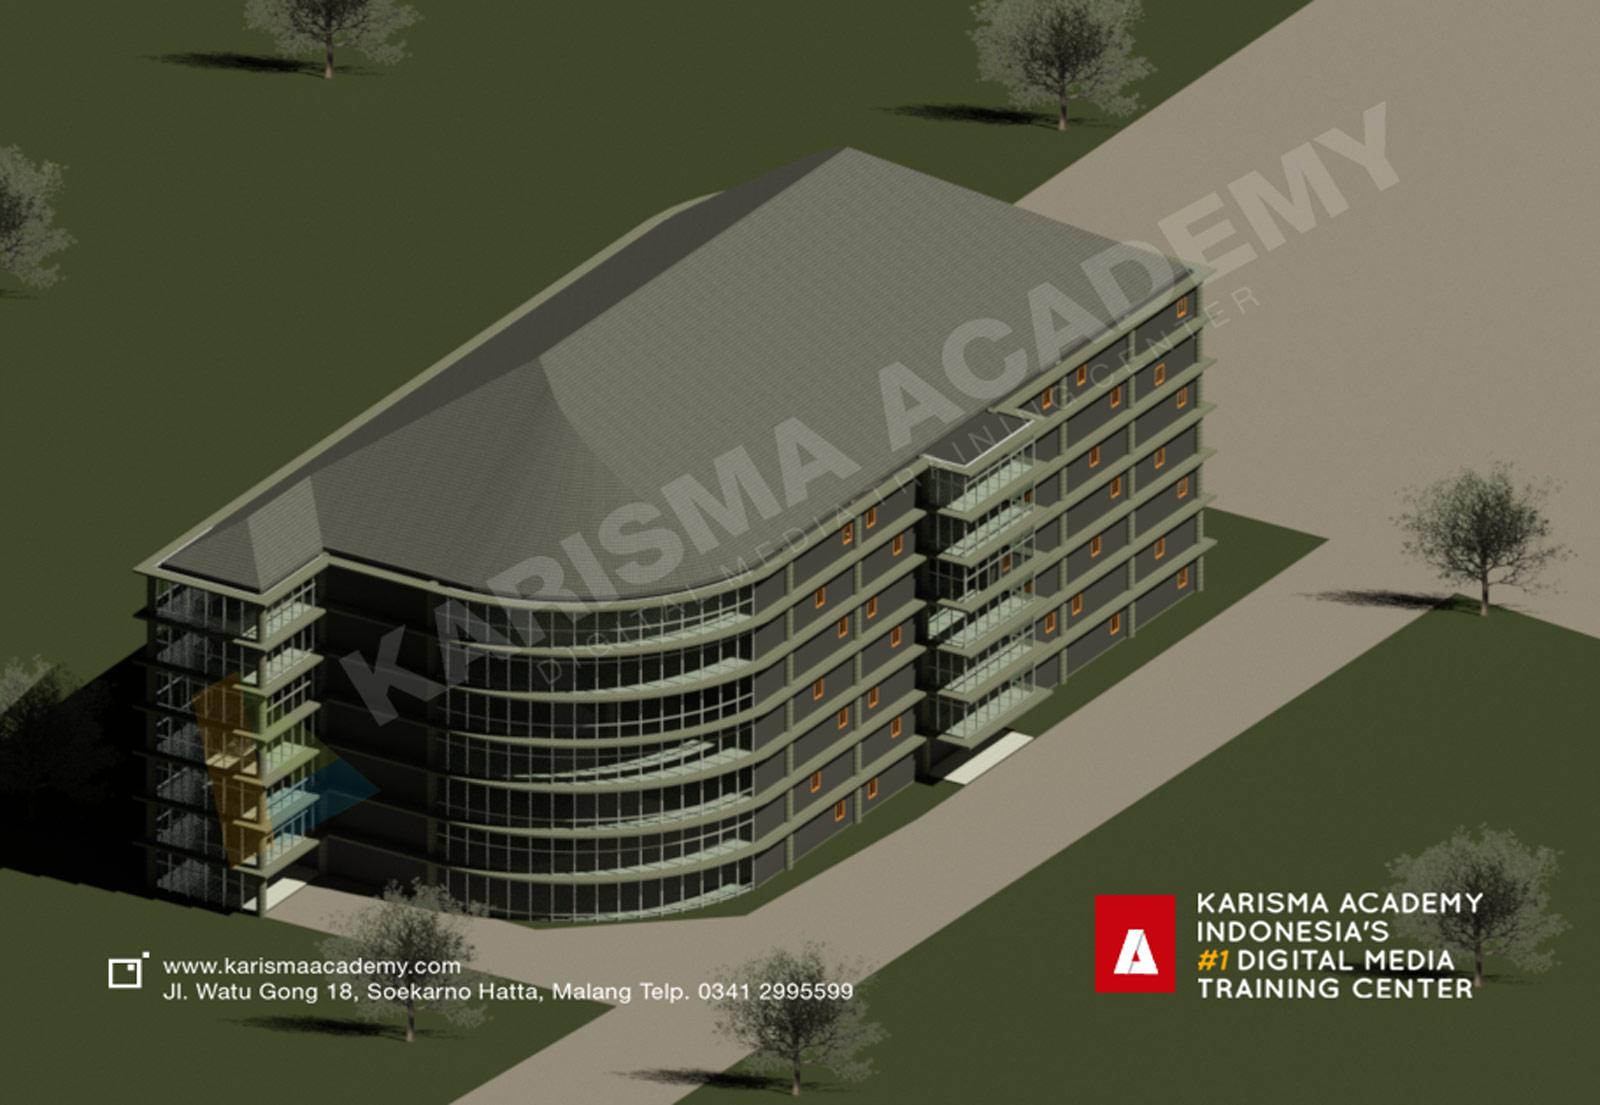 Karya dan Tugas Akhir Siswa Karisma Academy